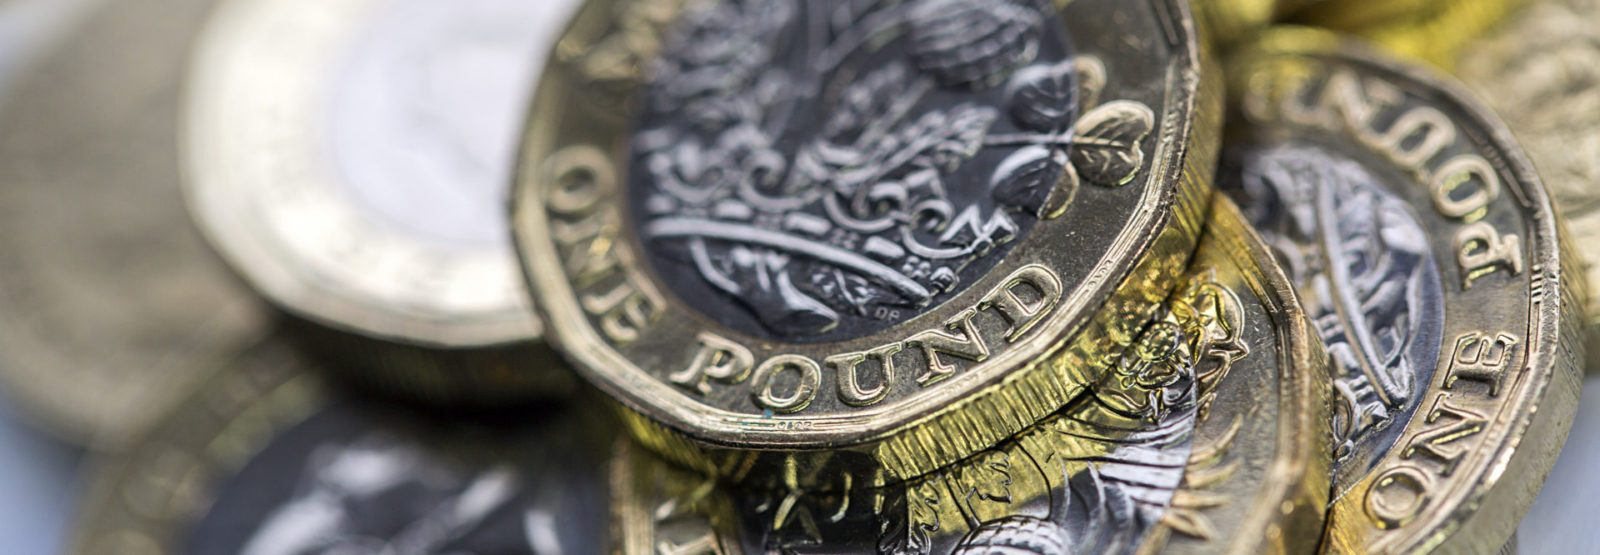 no-deal pound